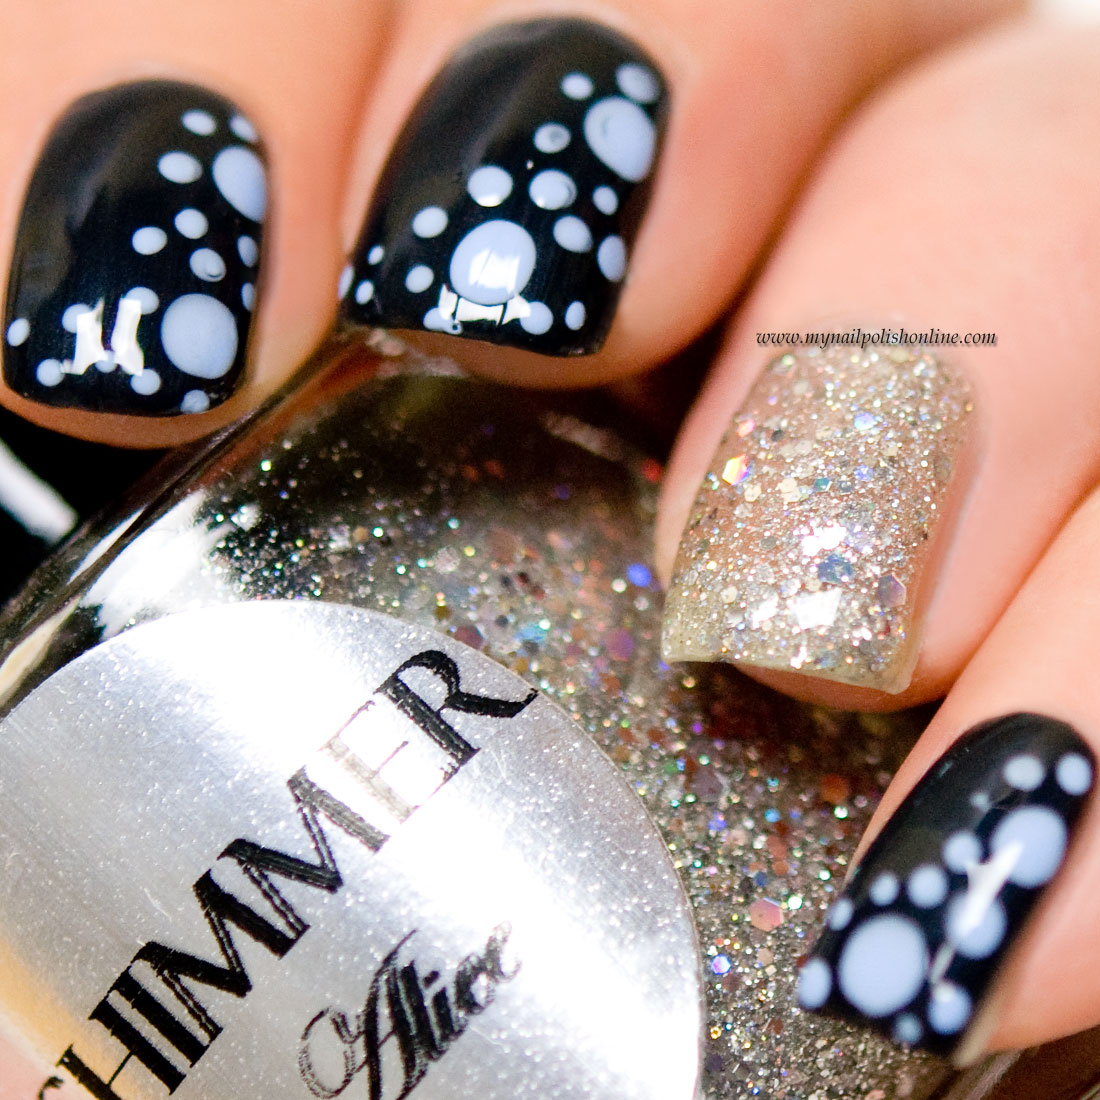 Nail Art - Dotticure